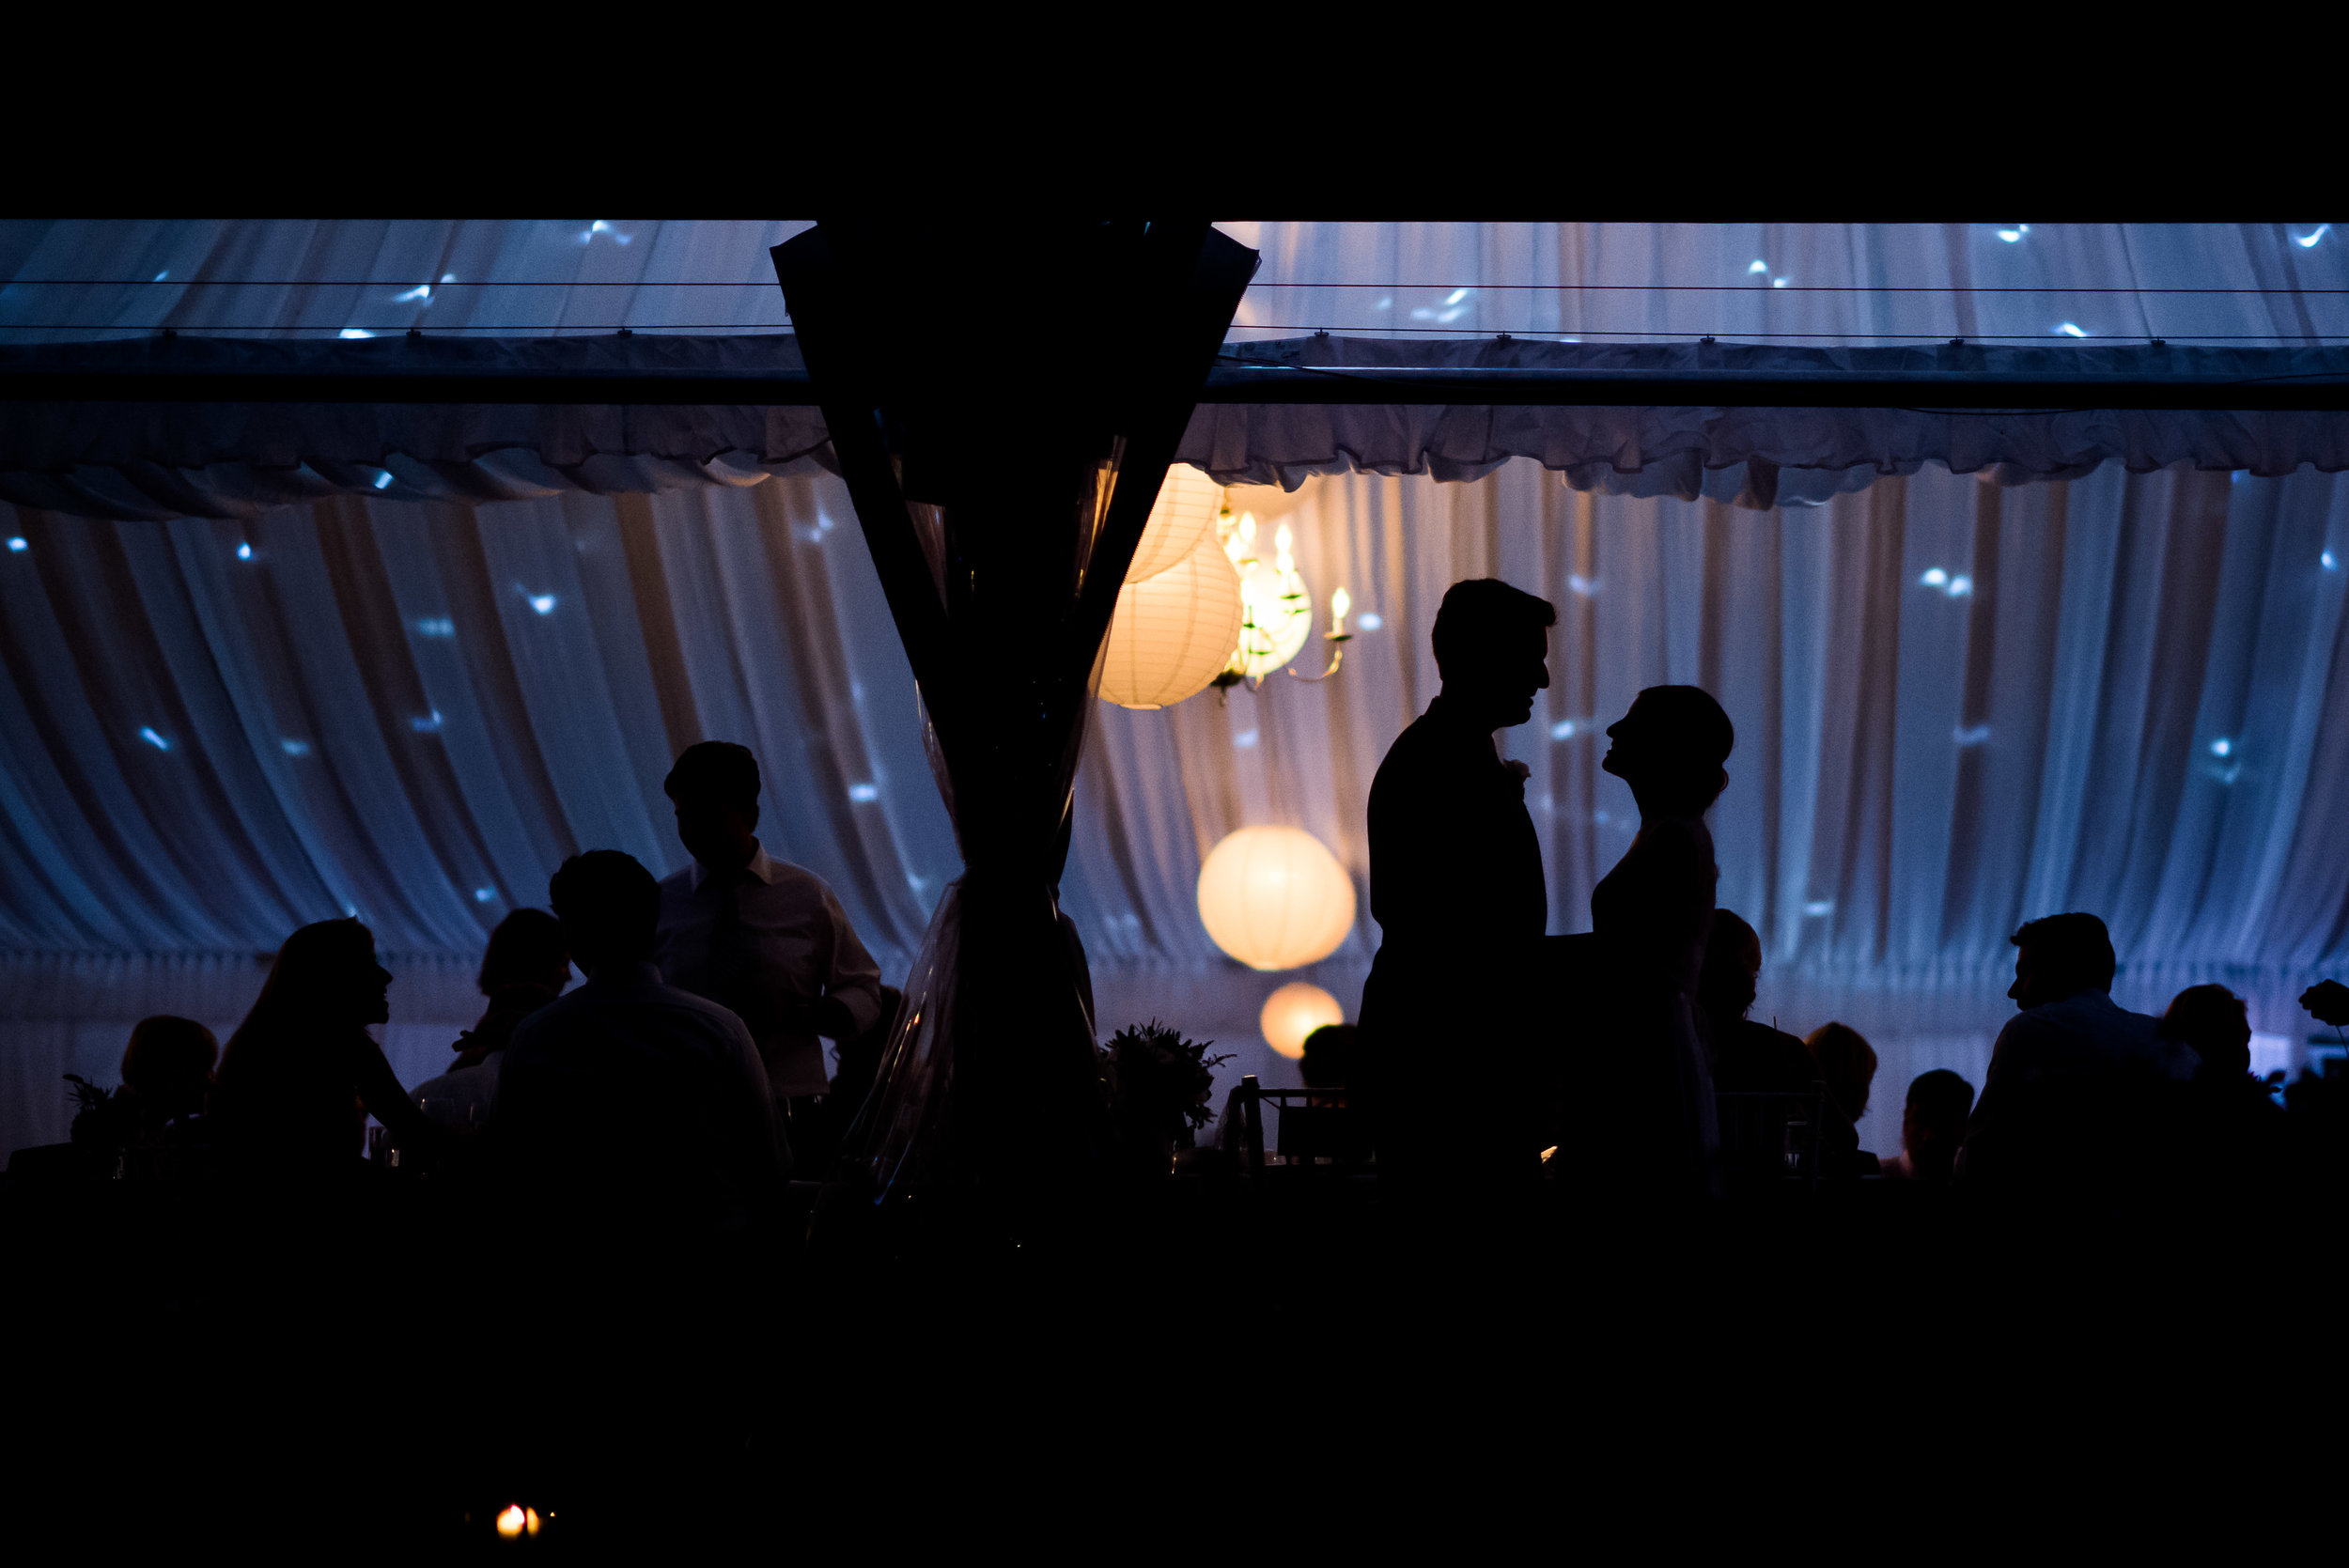 brandywine-wedding-tessie-reveliotis-photography-beautiful-and-blessed-events-010